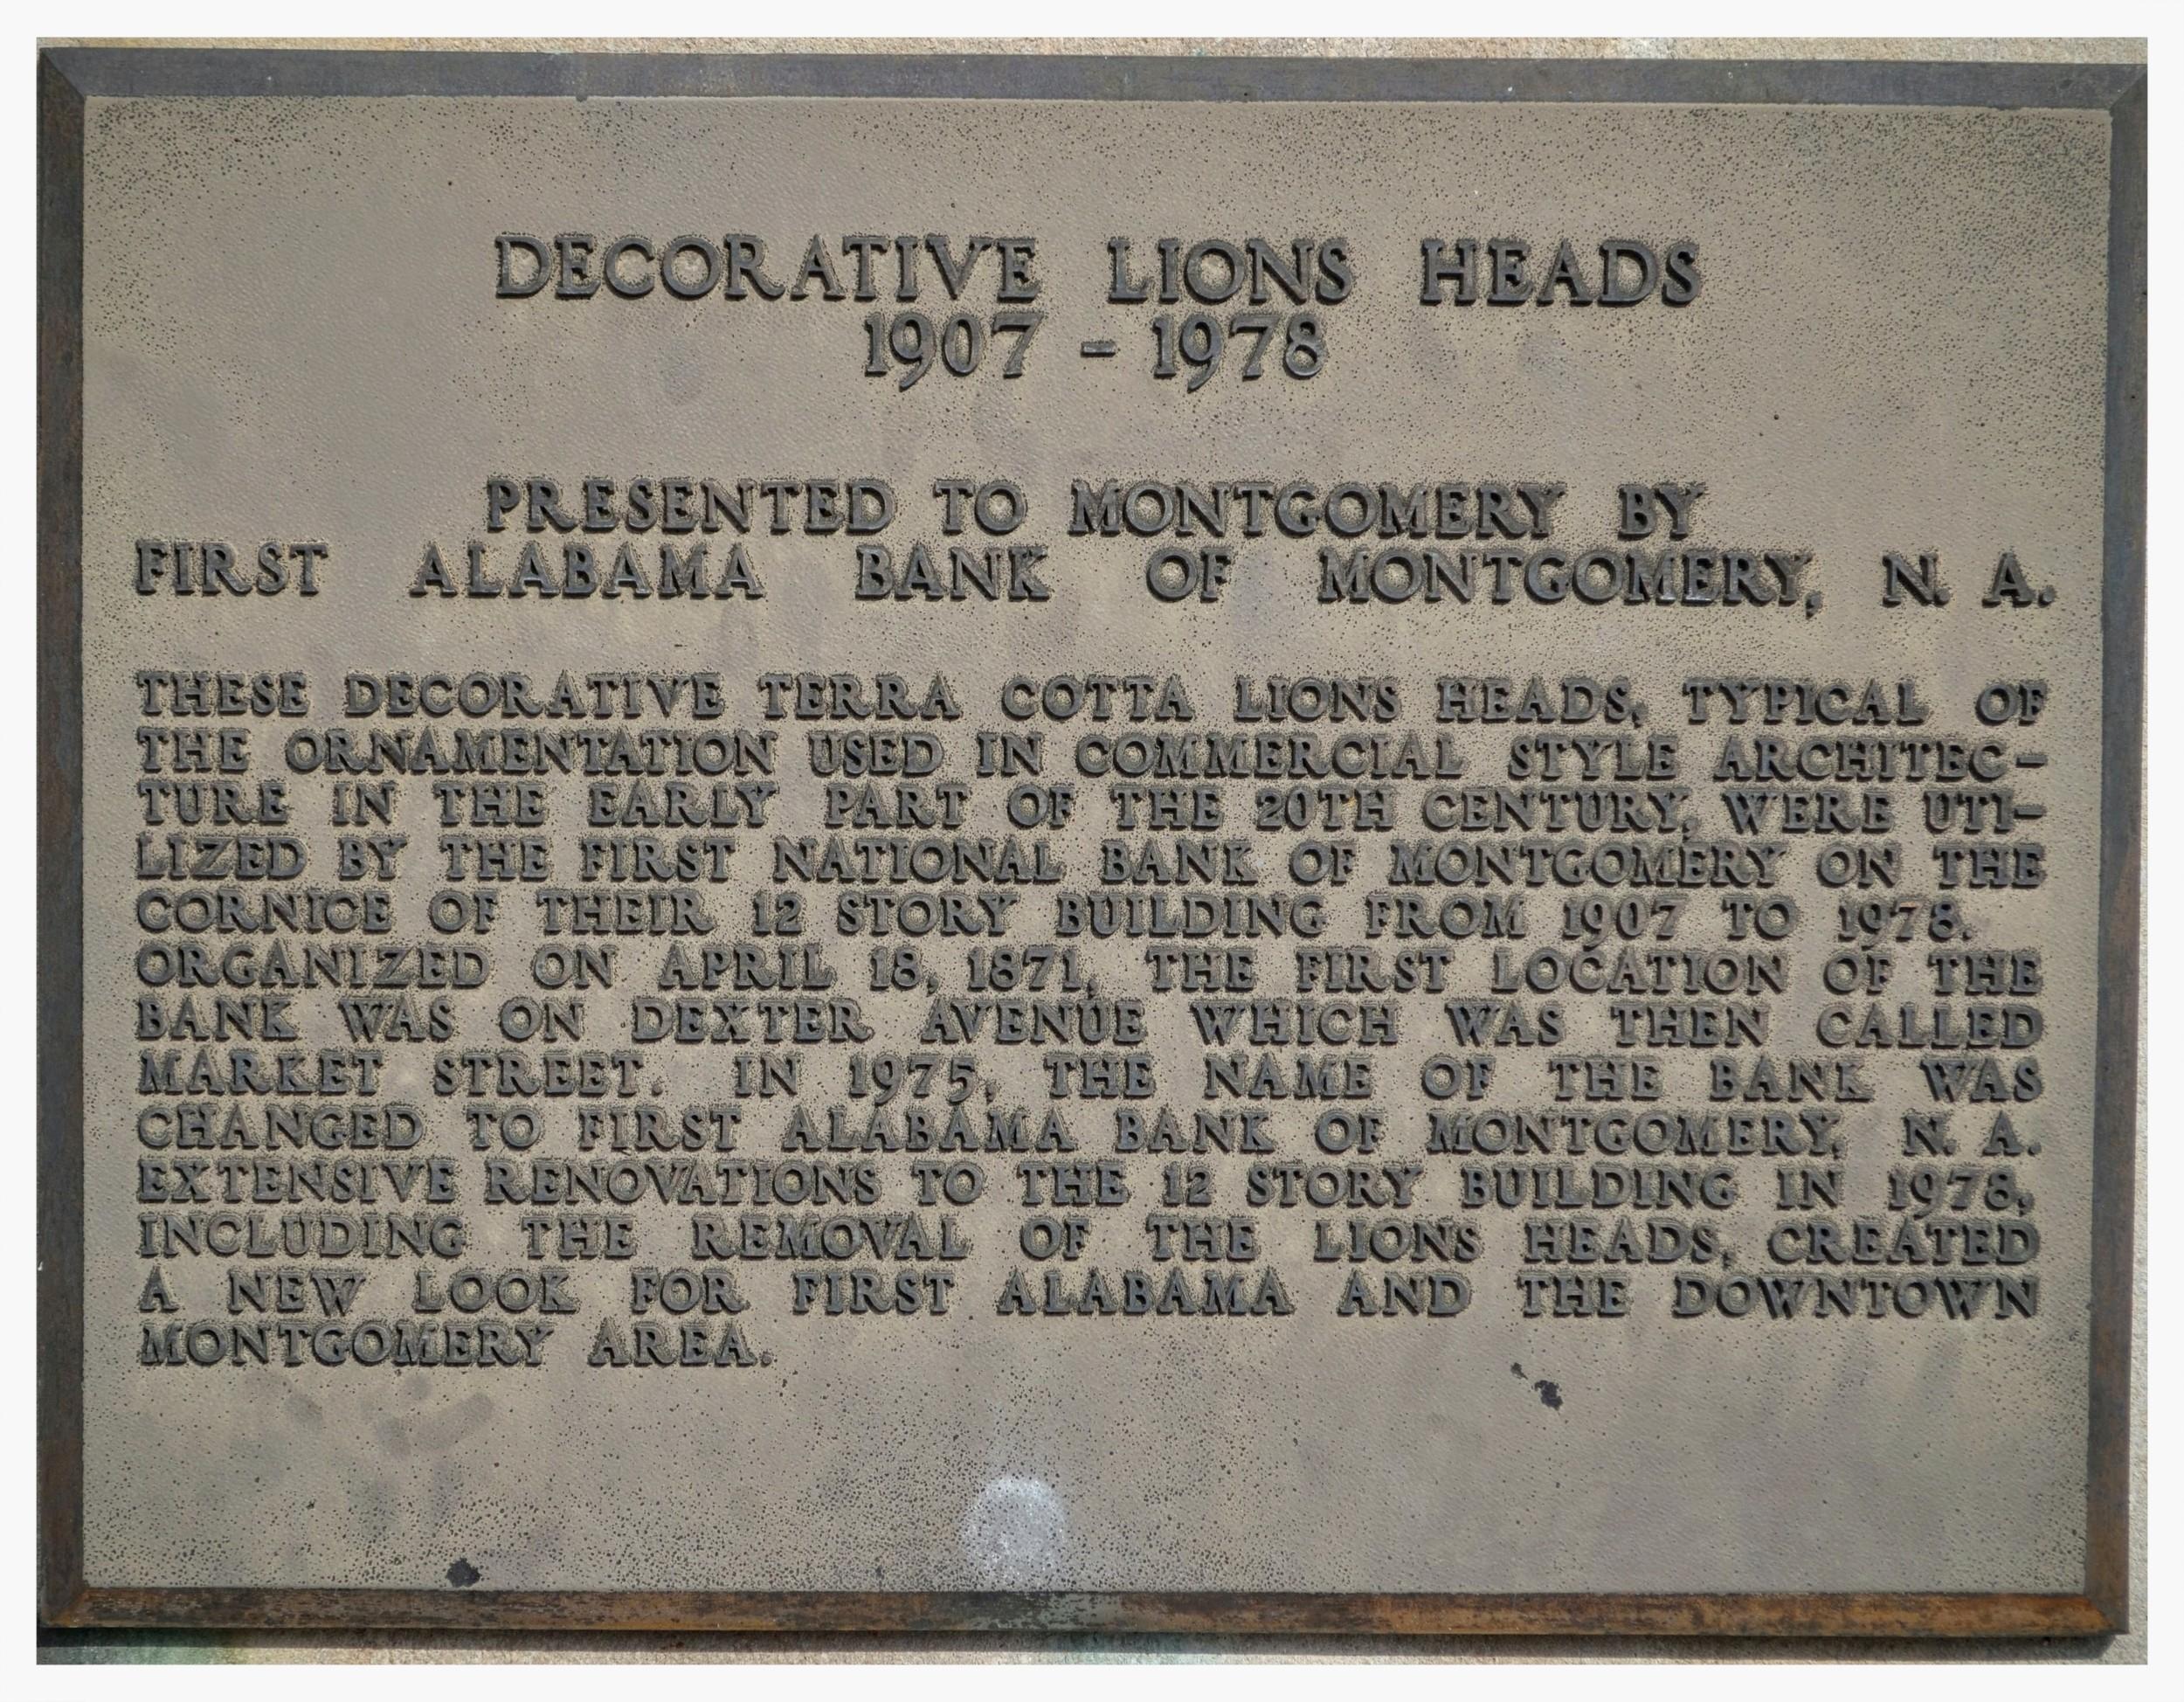 Decorative Lions Heads plaque, Court Square, Montgomery, Alabama